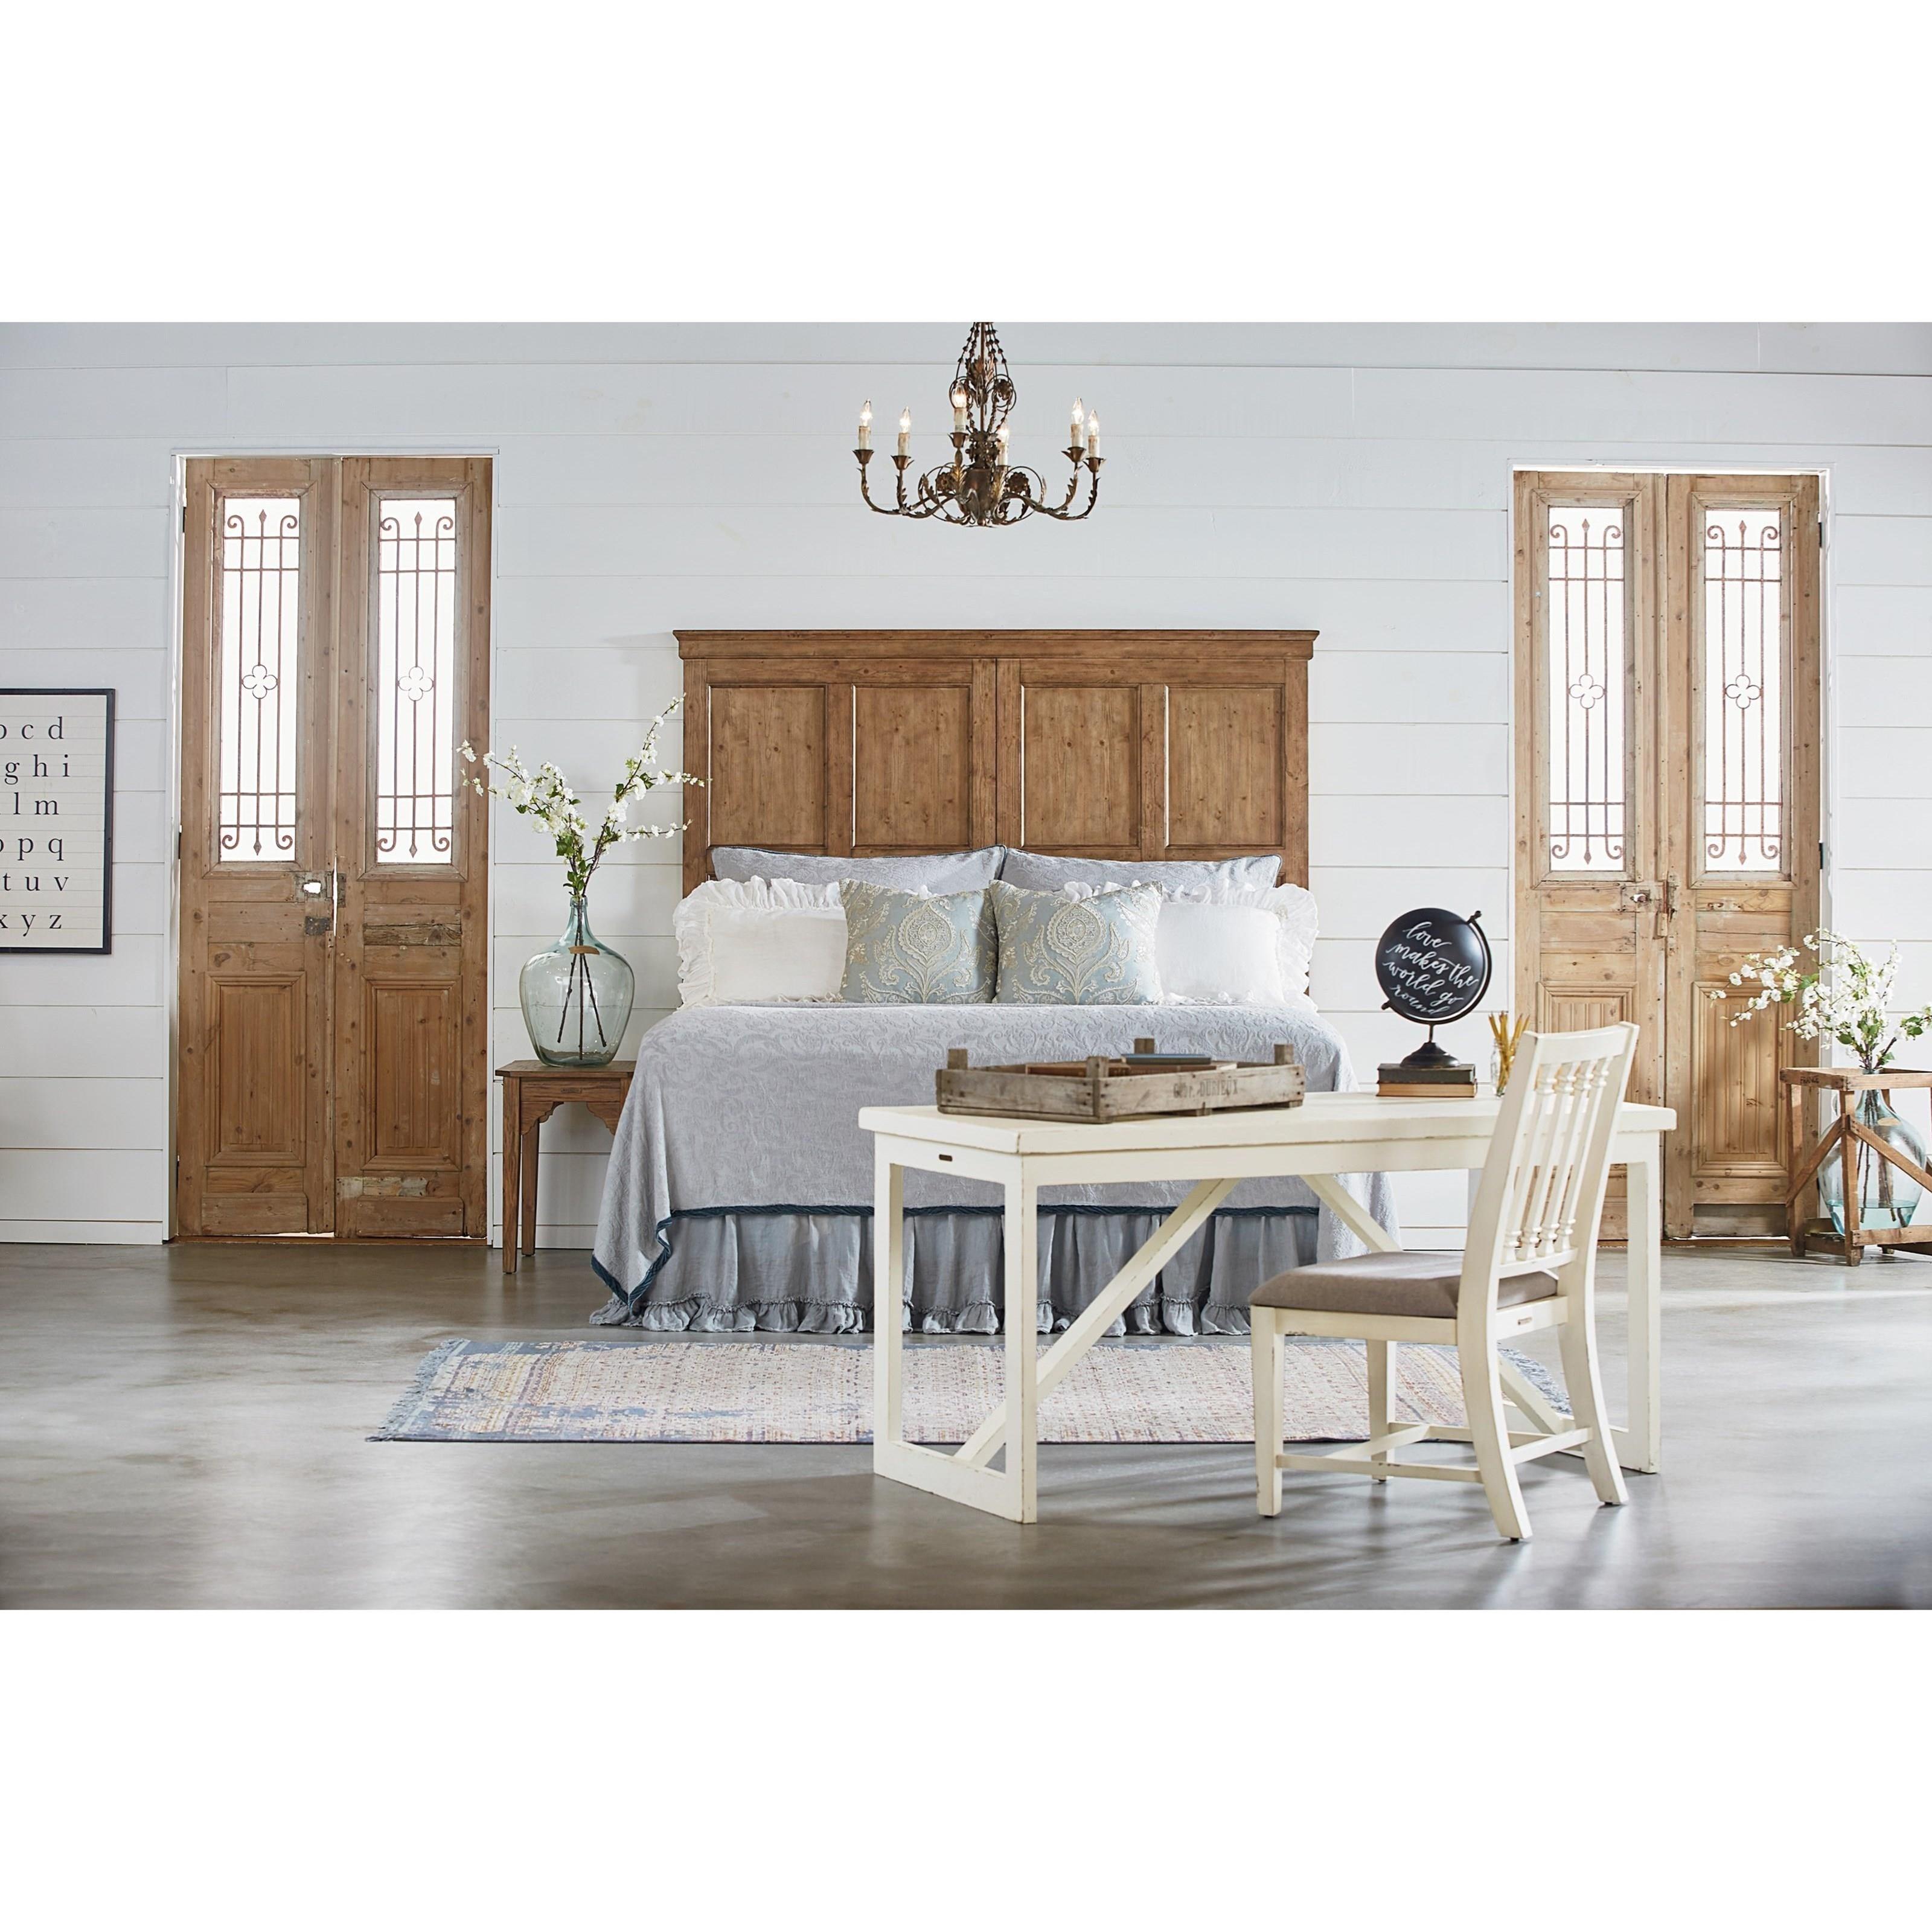 Magnolia home by joanna gaines farmhouse end table with for Magnolia farmhouse